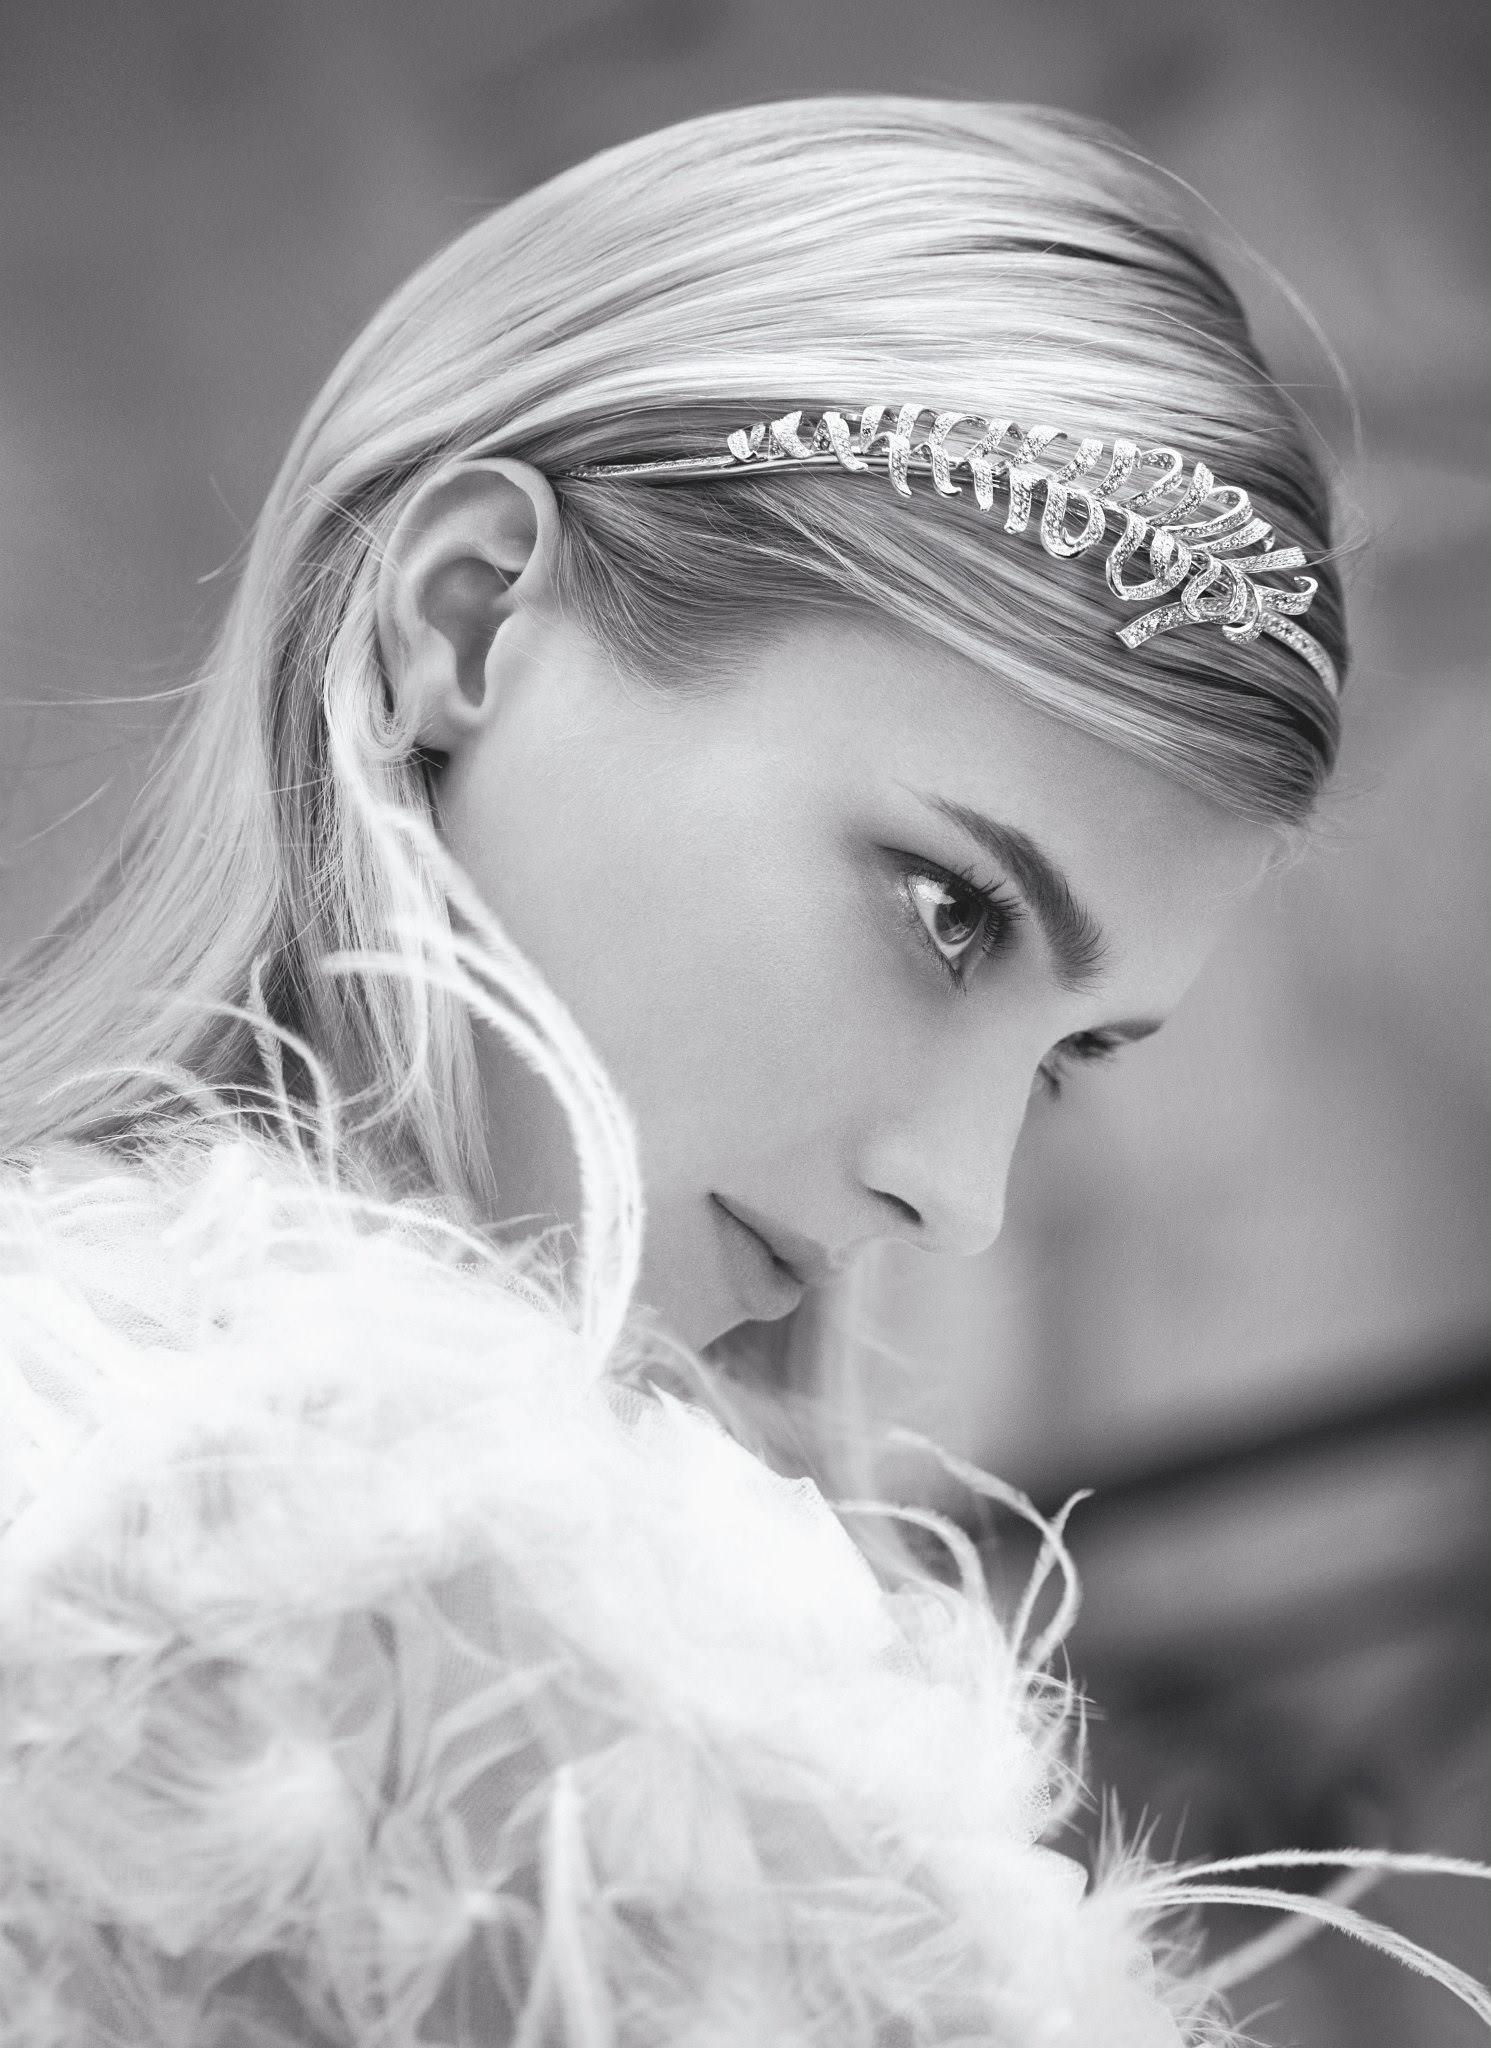 Joyas Plume de Chanel Colección 1932